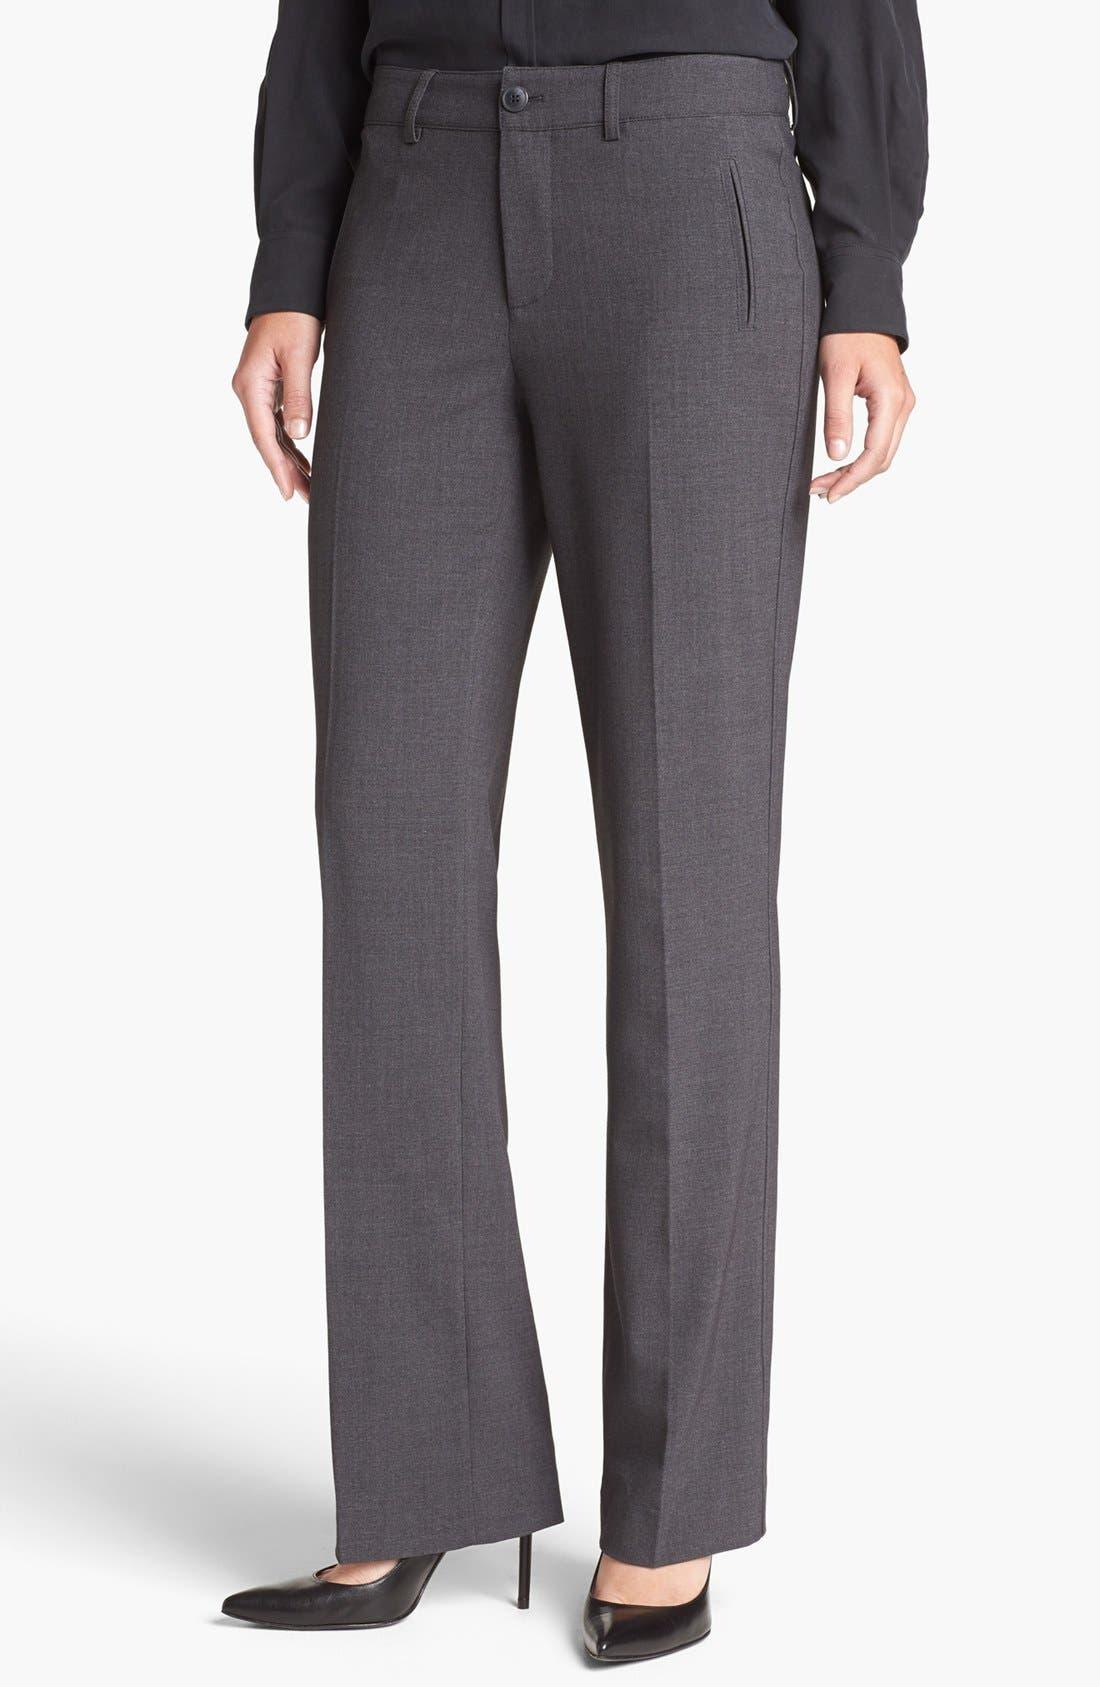 Alternate Image 1 Selected - NYDJ Stretch Straight Leg Trousers (Petite)